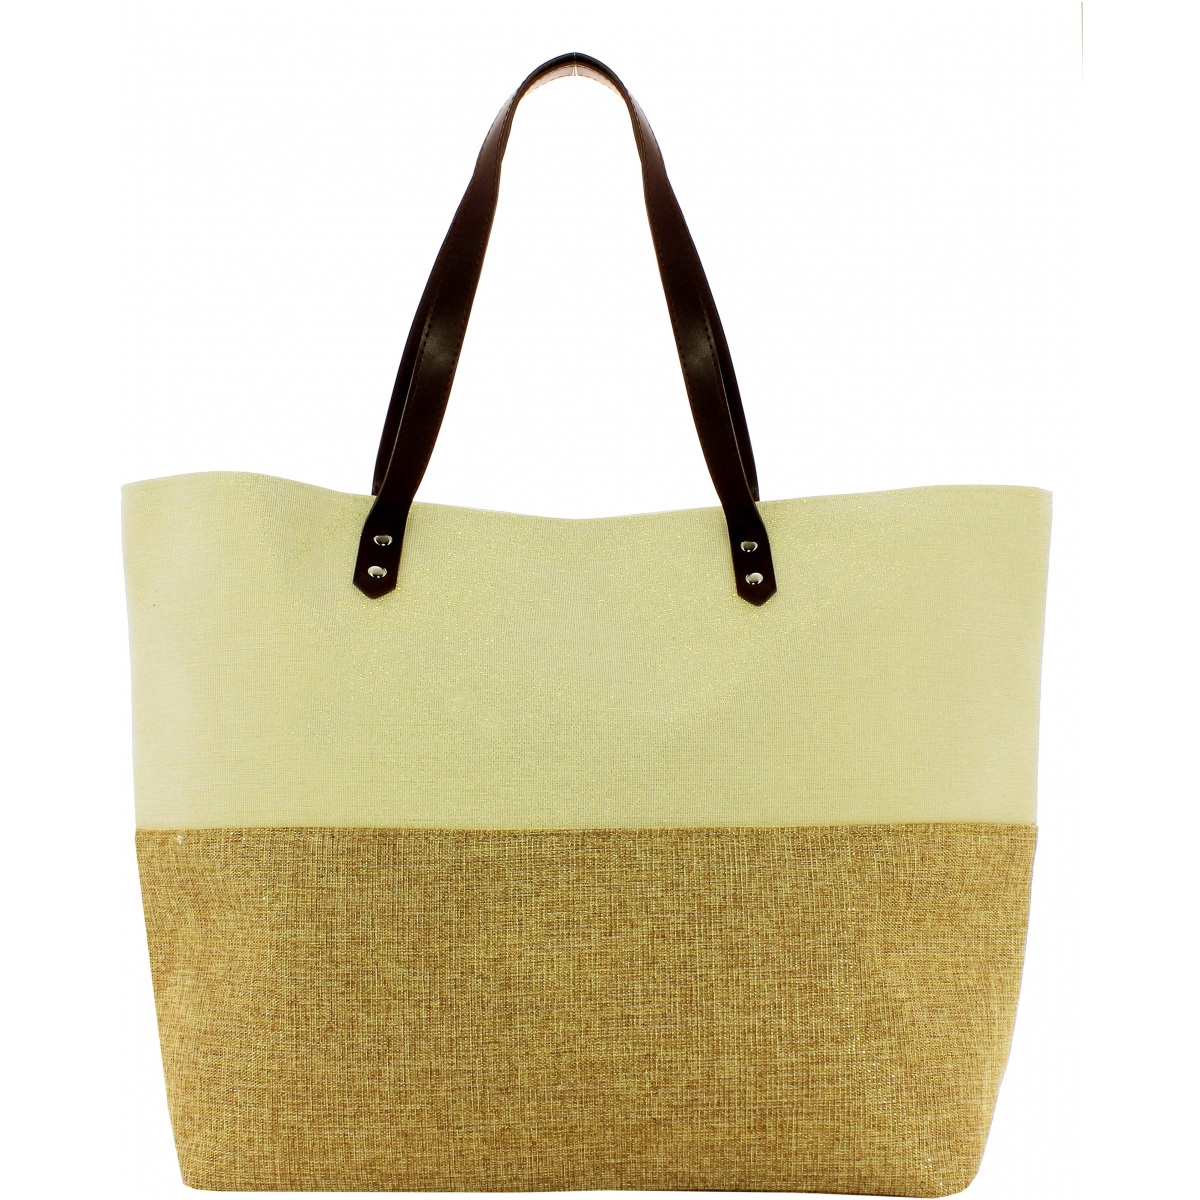 sac de plage brillant les sacs de krlot. Black Bedroom Furniture Sets. Home Design Ideas